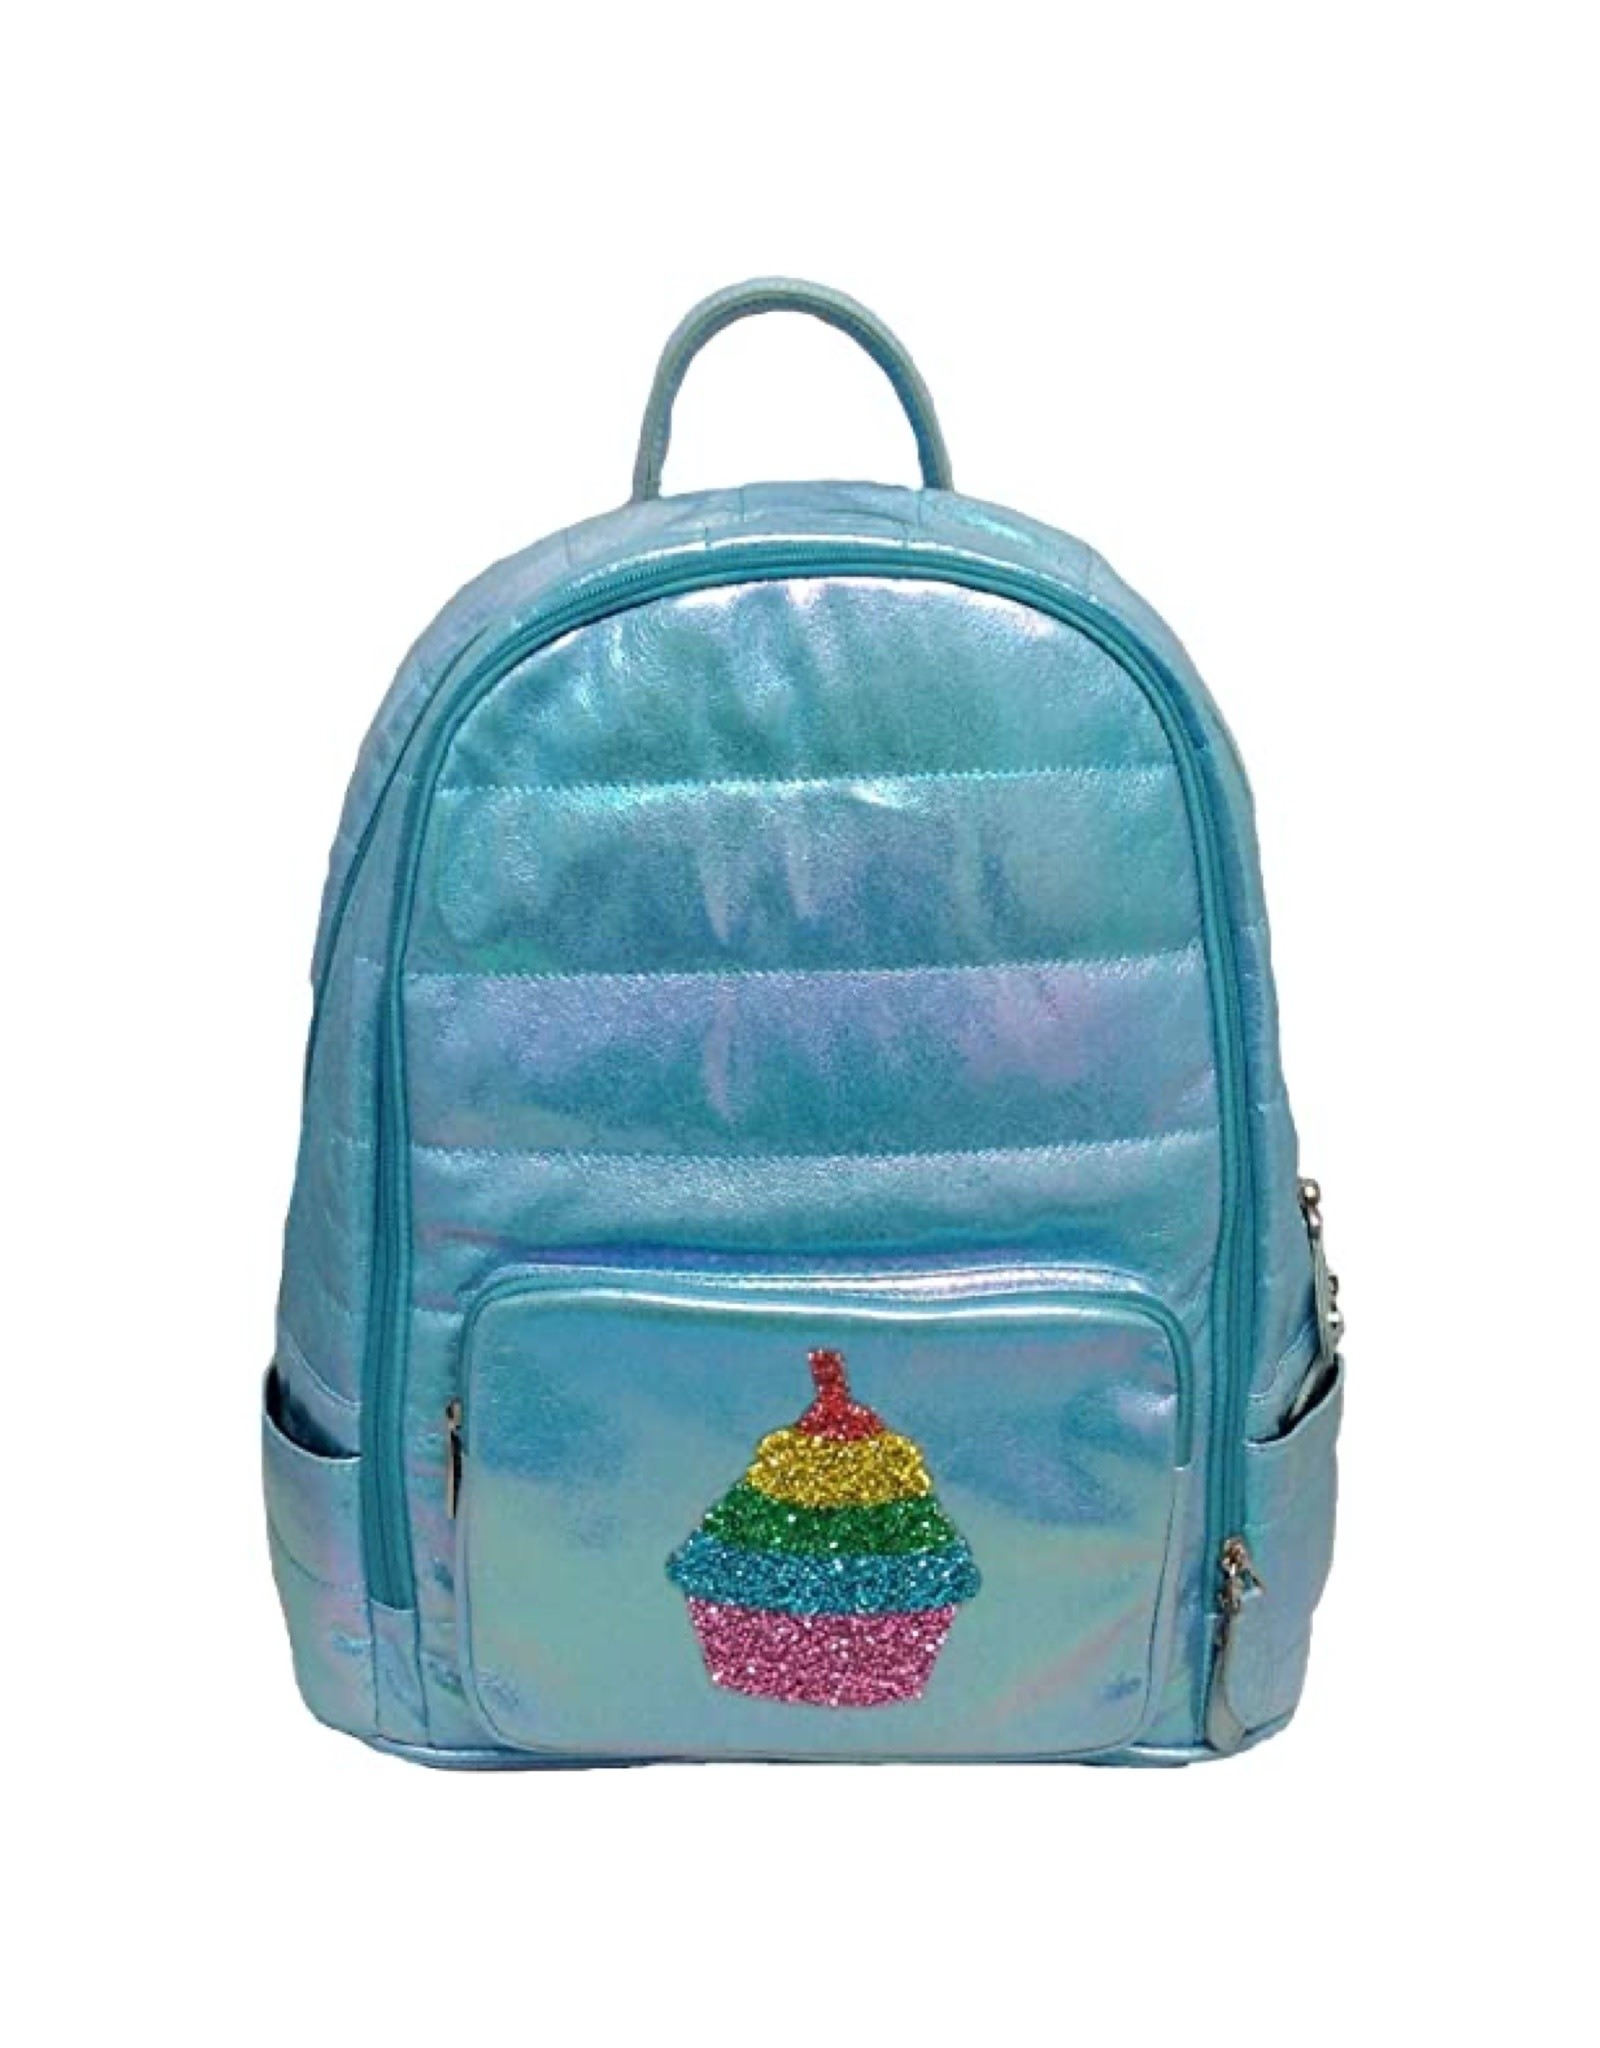 Bari Lynn Blue Iridescent Cupcake Puffy Backpack